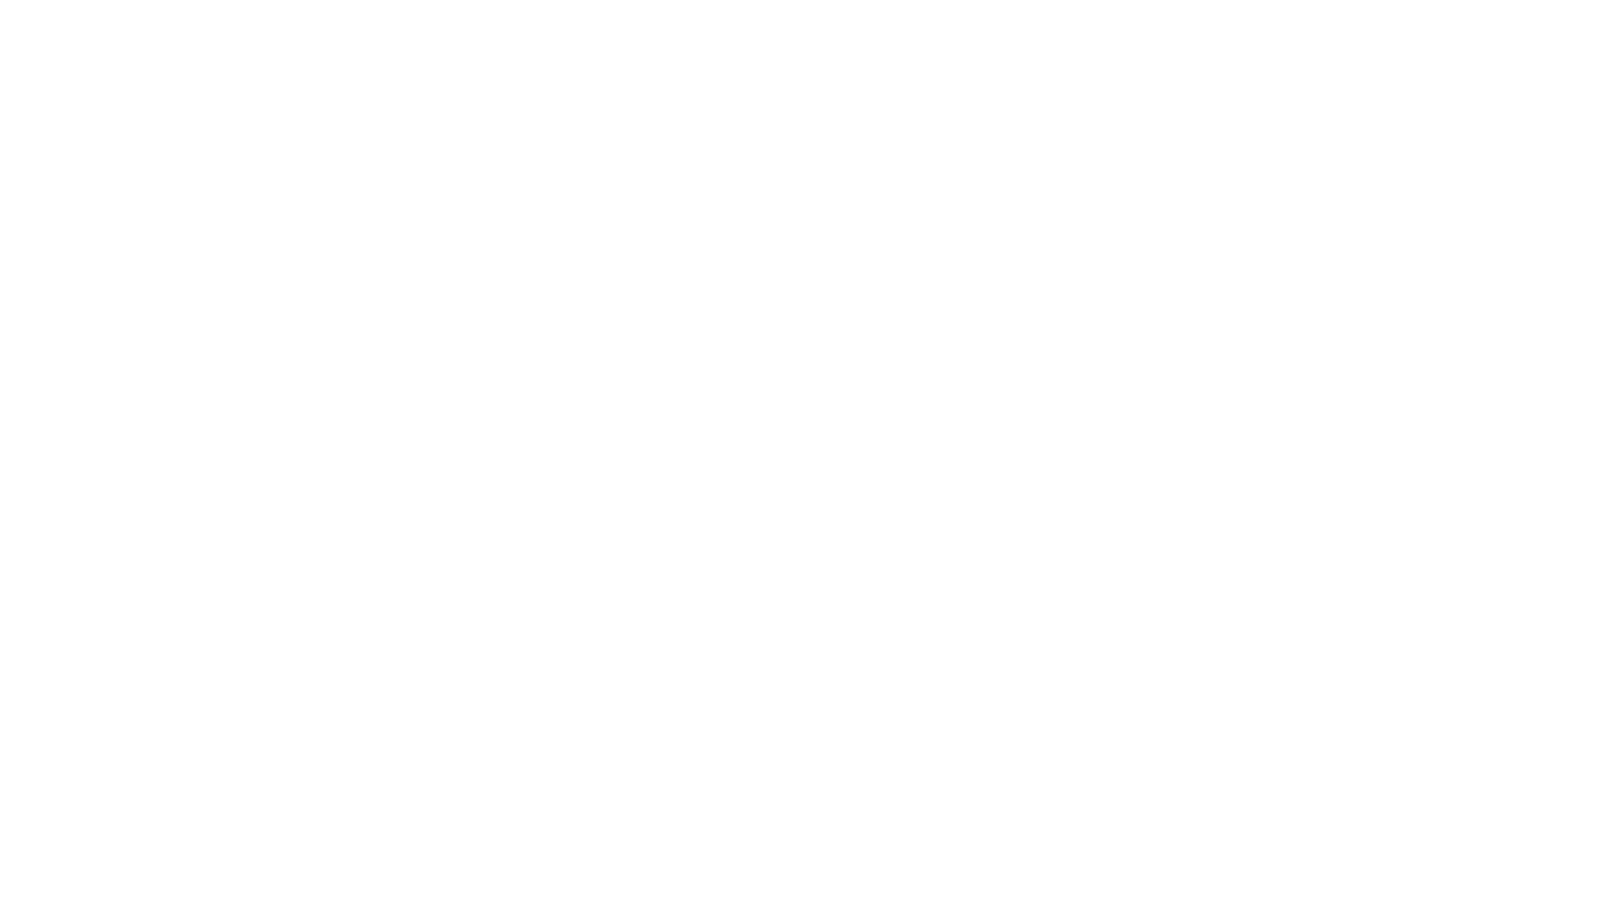 "SARAS ( SAR Air Soegijapranata) adalah UKM yang mewadahi civitas akademika UNIKA Soegijapranata untuk mengasah kemampuan dan skill di bidang bawah air. Sehingga nantinya dapat berguna bagi kegiatan kemanusiaan di bidang bawah air. SARAS sendiri memegang motto ""Rescue is costly, but LOVE pays the price."" Sehingga setiap kegiatan dan program SARAS sendiri selalu didasari dengan cinta kasih dan simpati pada sesama.  http://www.unika.ac.id/saras/"